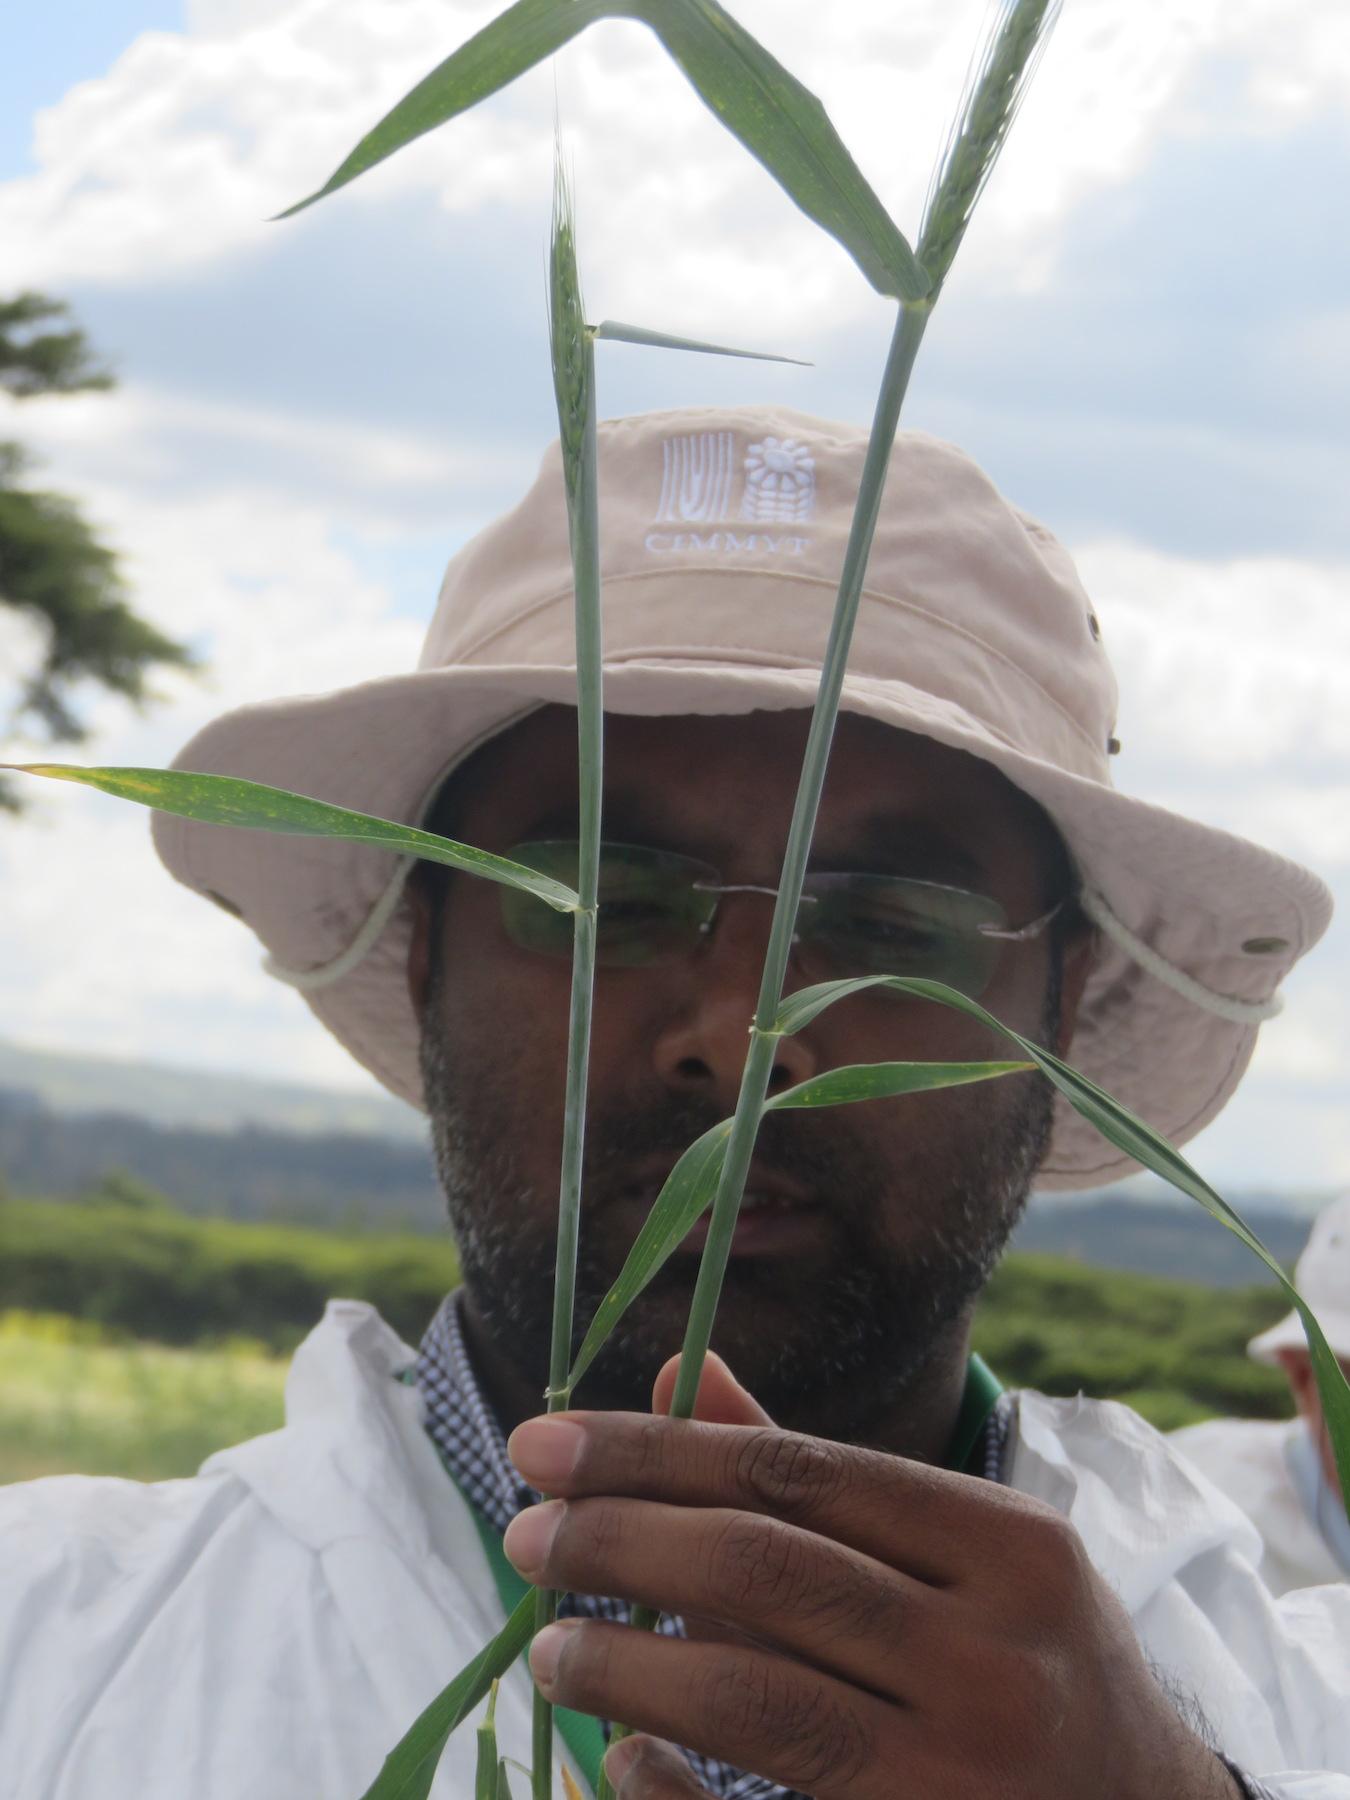 CIMMYT scientist Mandeep Randhawa indicates exact wheat plant stage for stem rust inoculation during the wheat stem rust training. (Photo: KALRO)